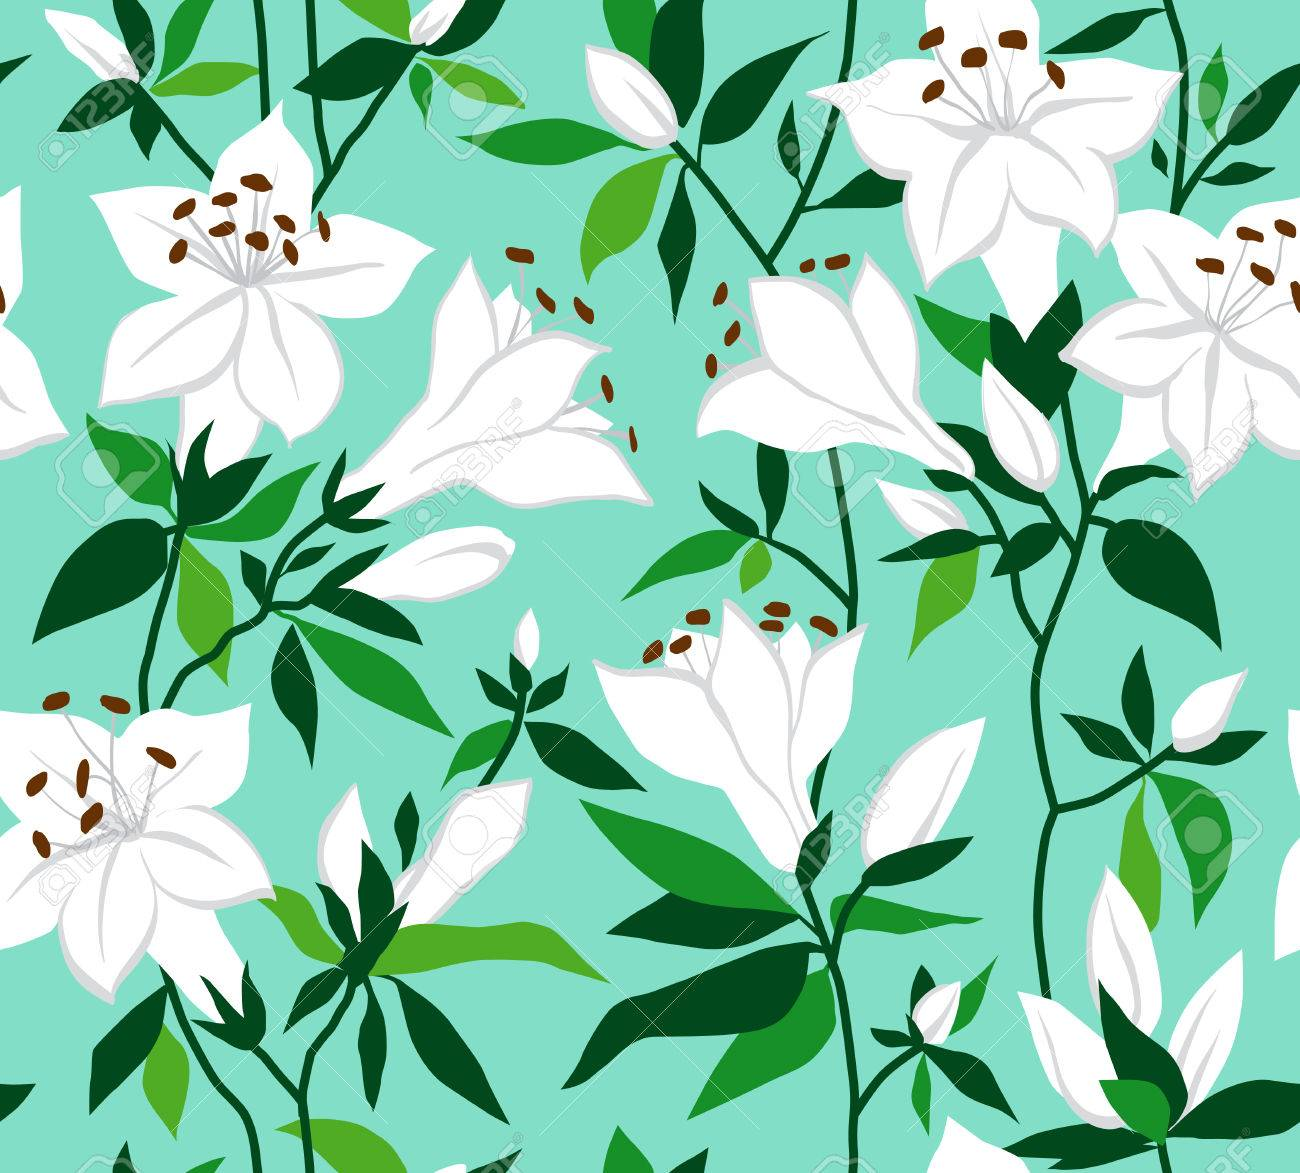 Retro Seamless Floral Background With White Flowers On Azaleas